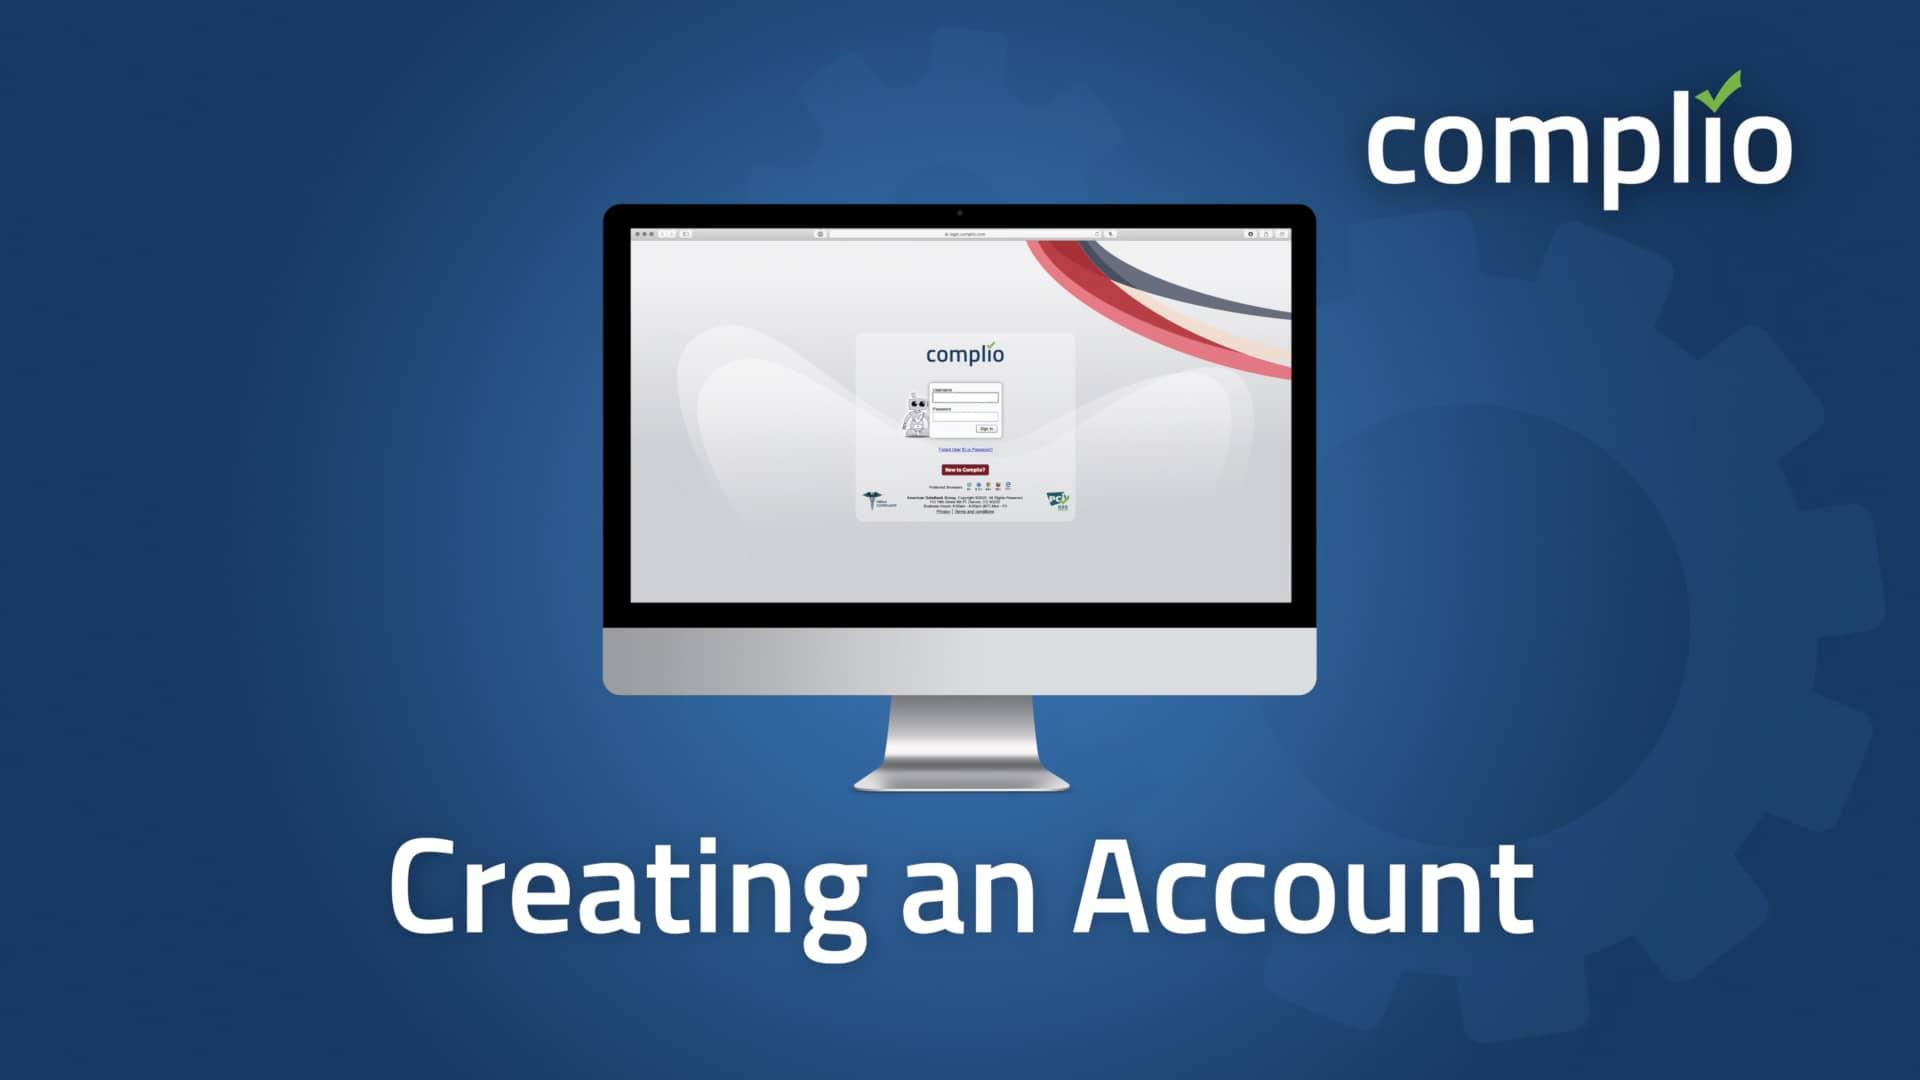 Complio Creating an Account